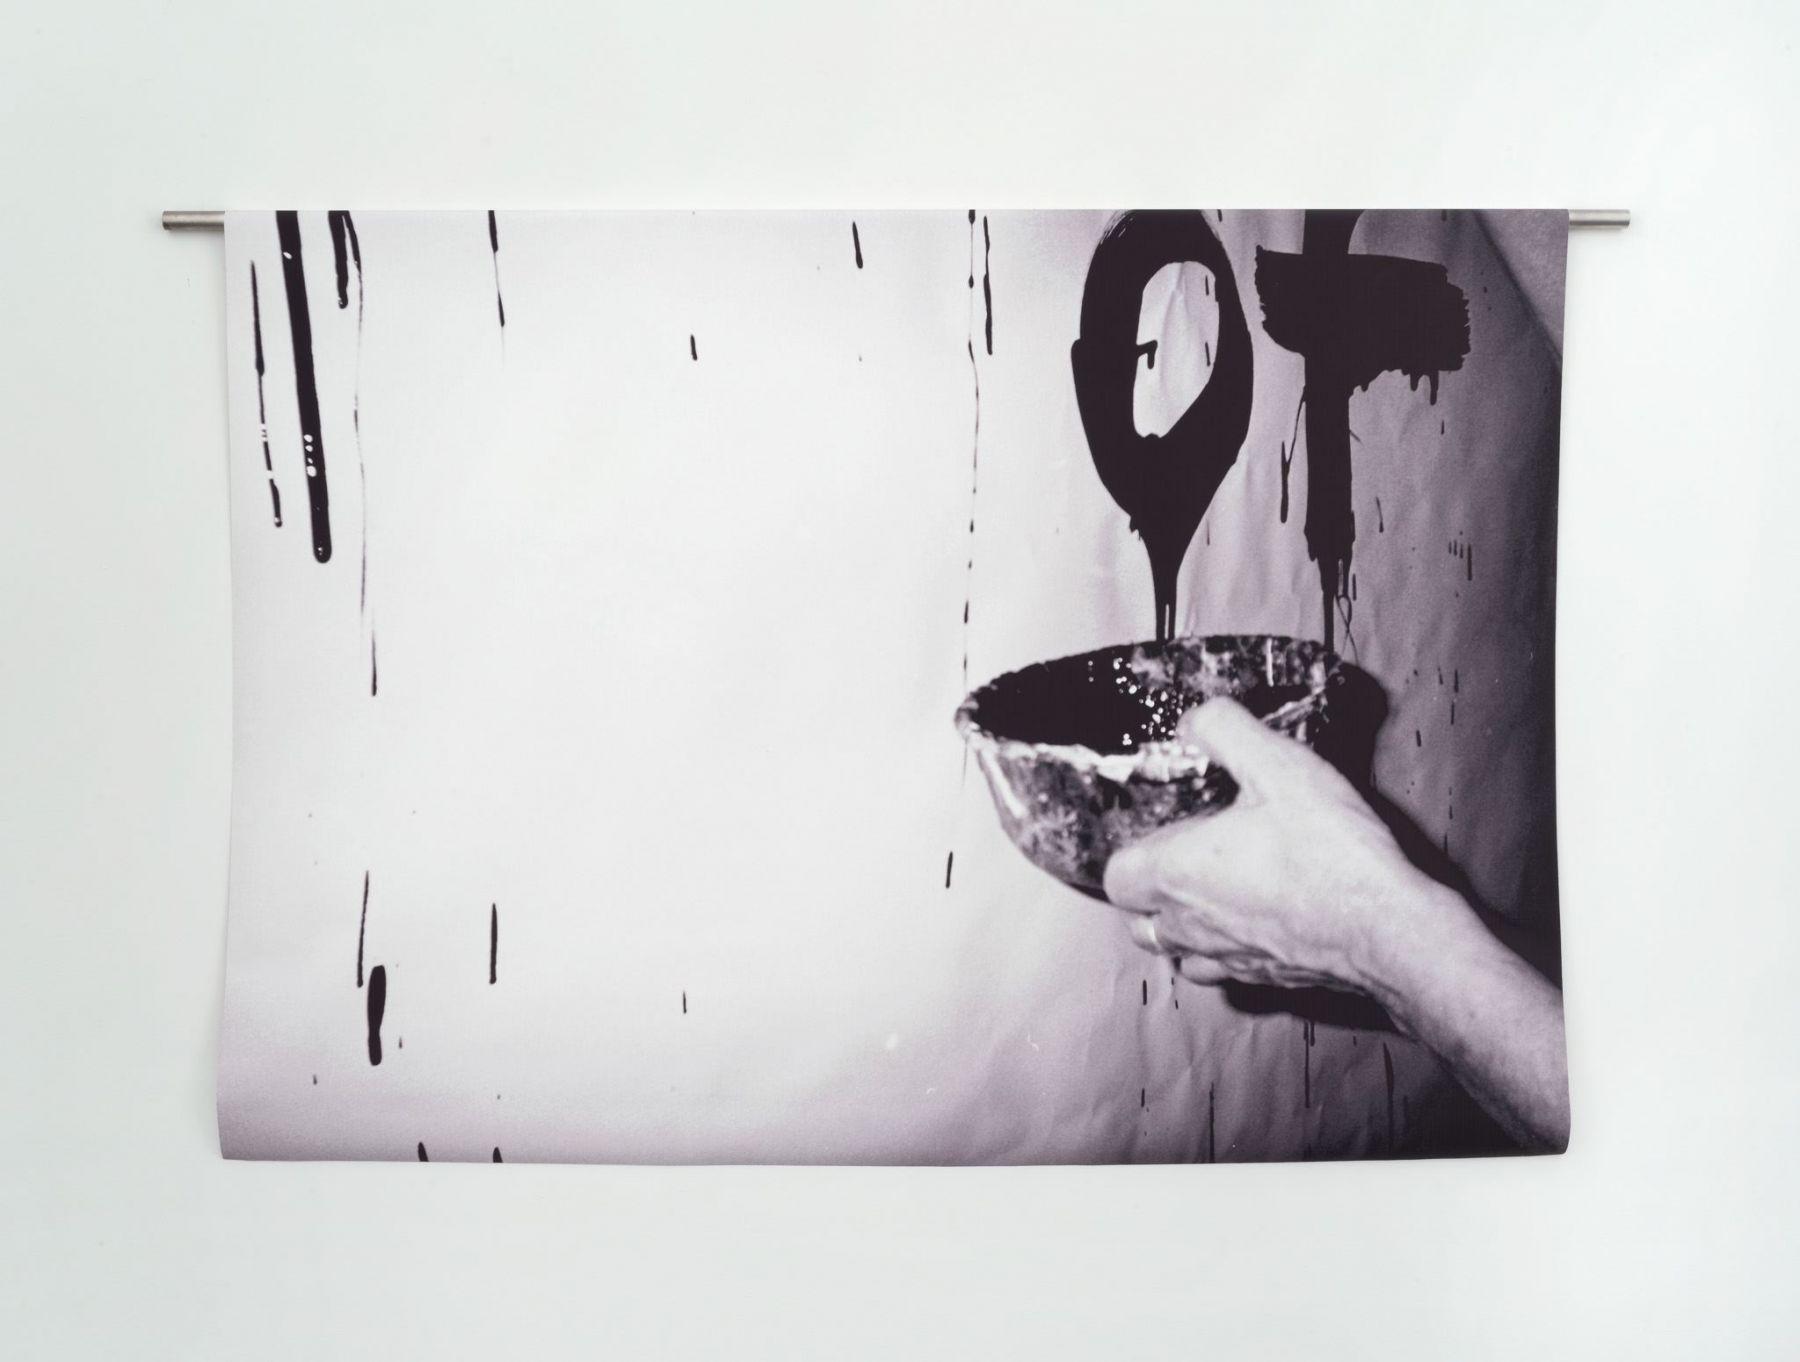 Kim Gordon, The vessel, a performance, 2015